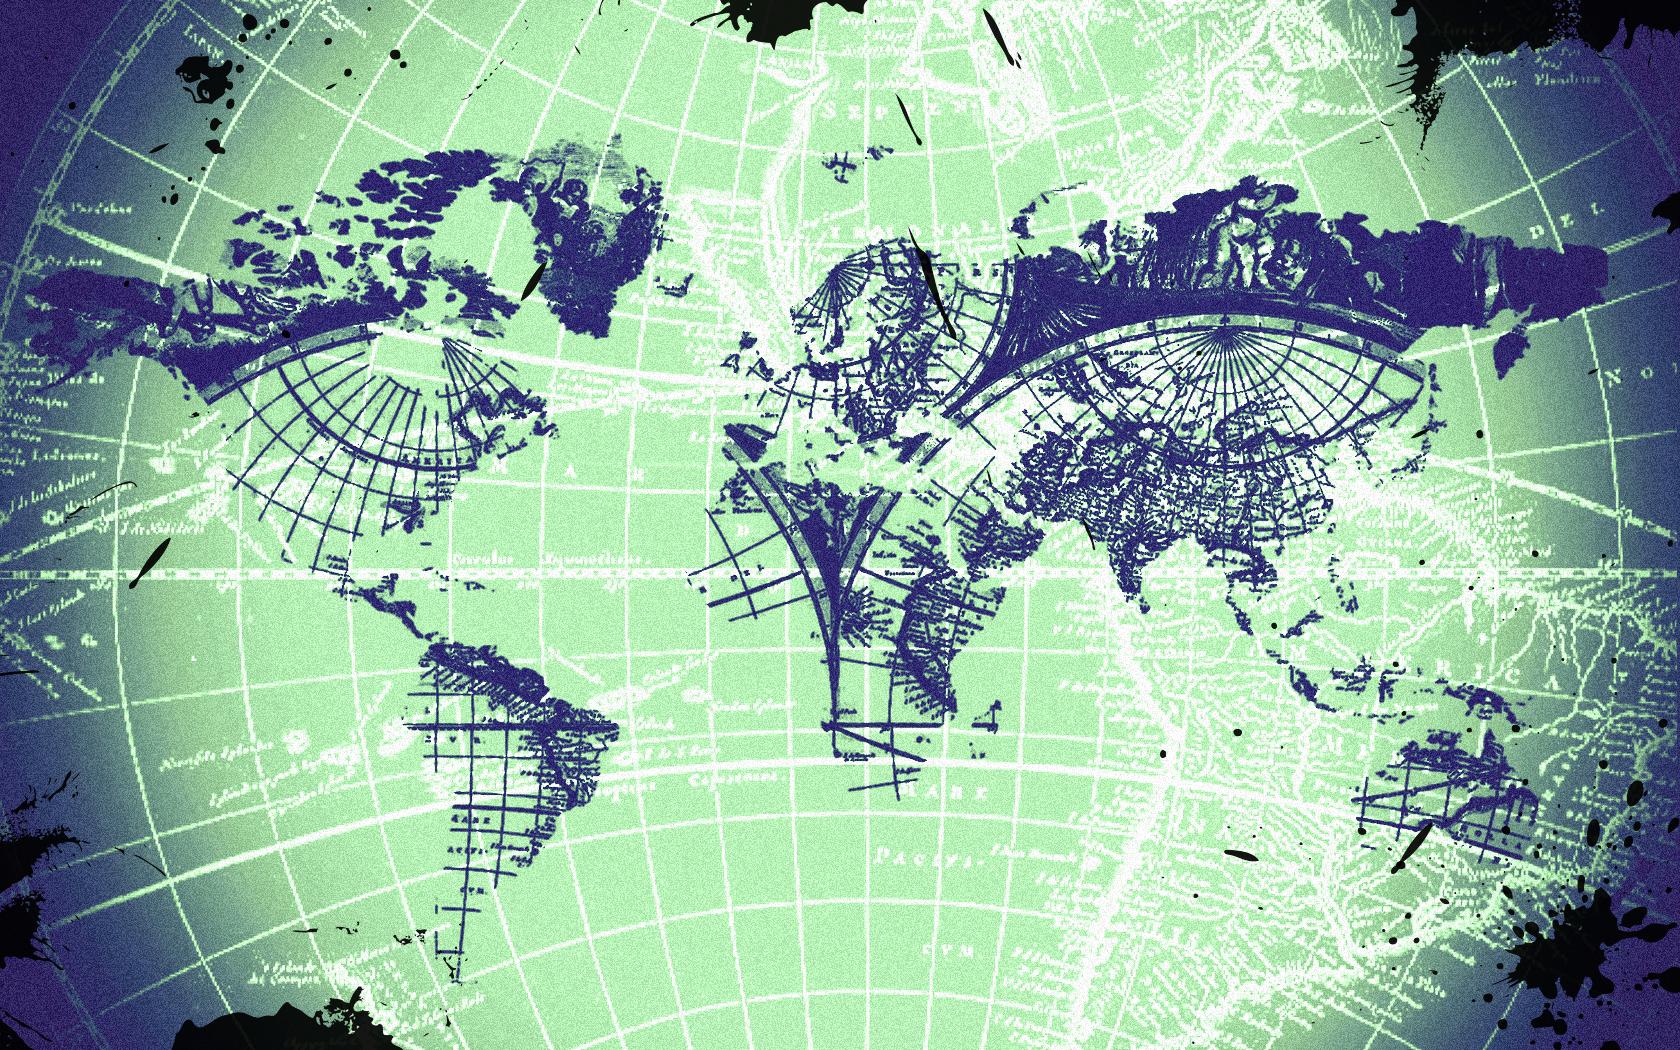 Mapmaker Wallpaper by Uwwmatt